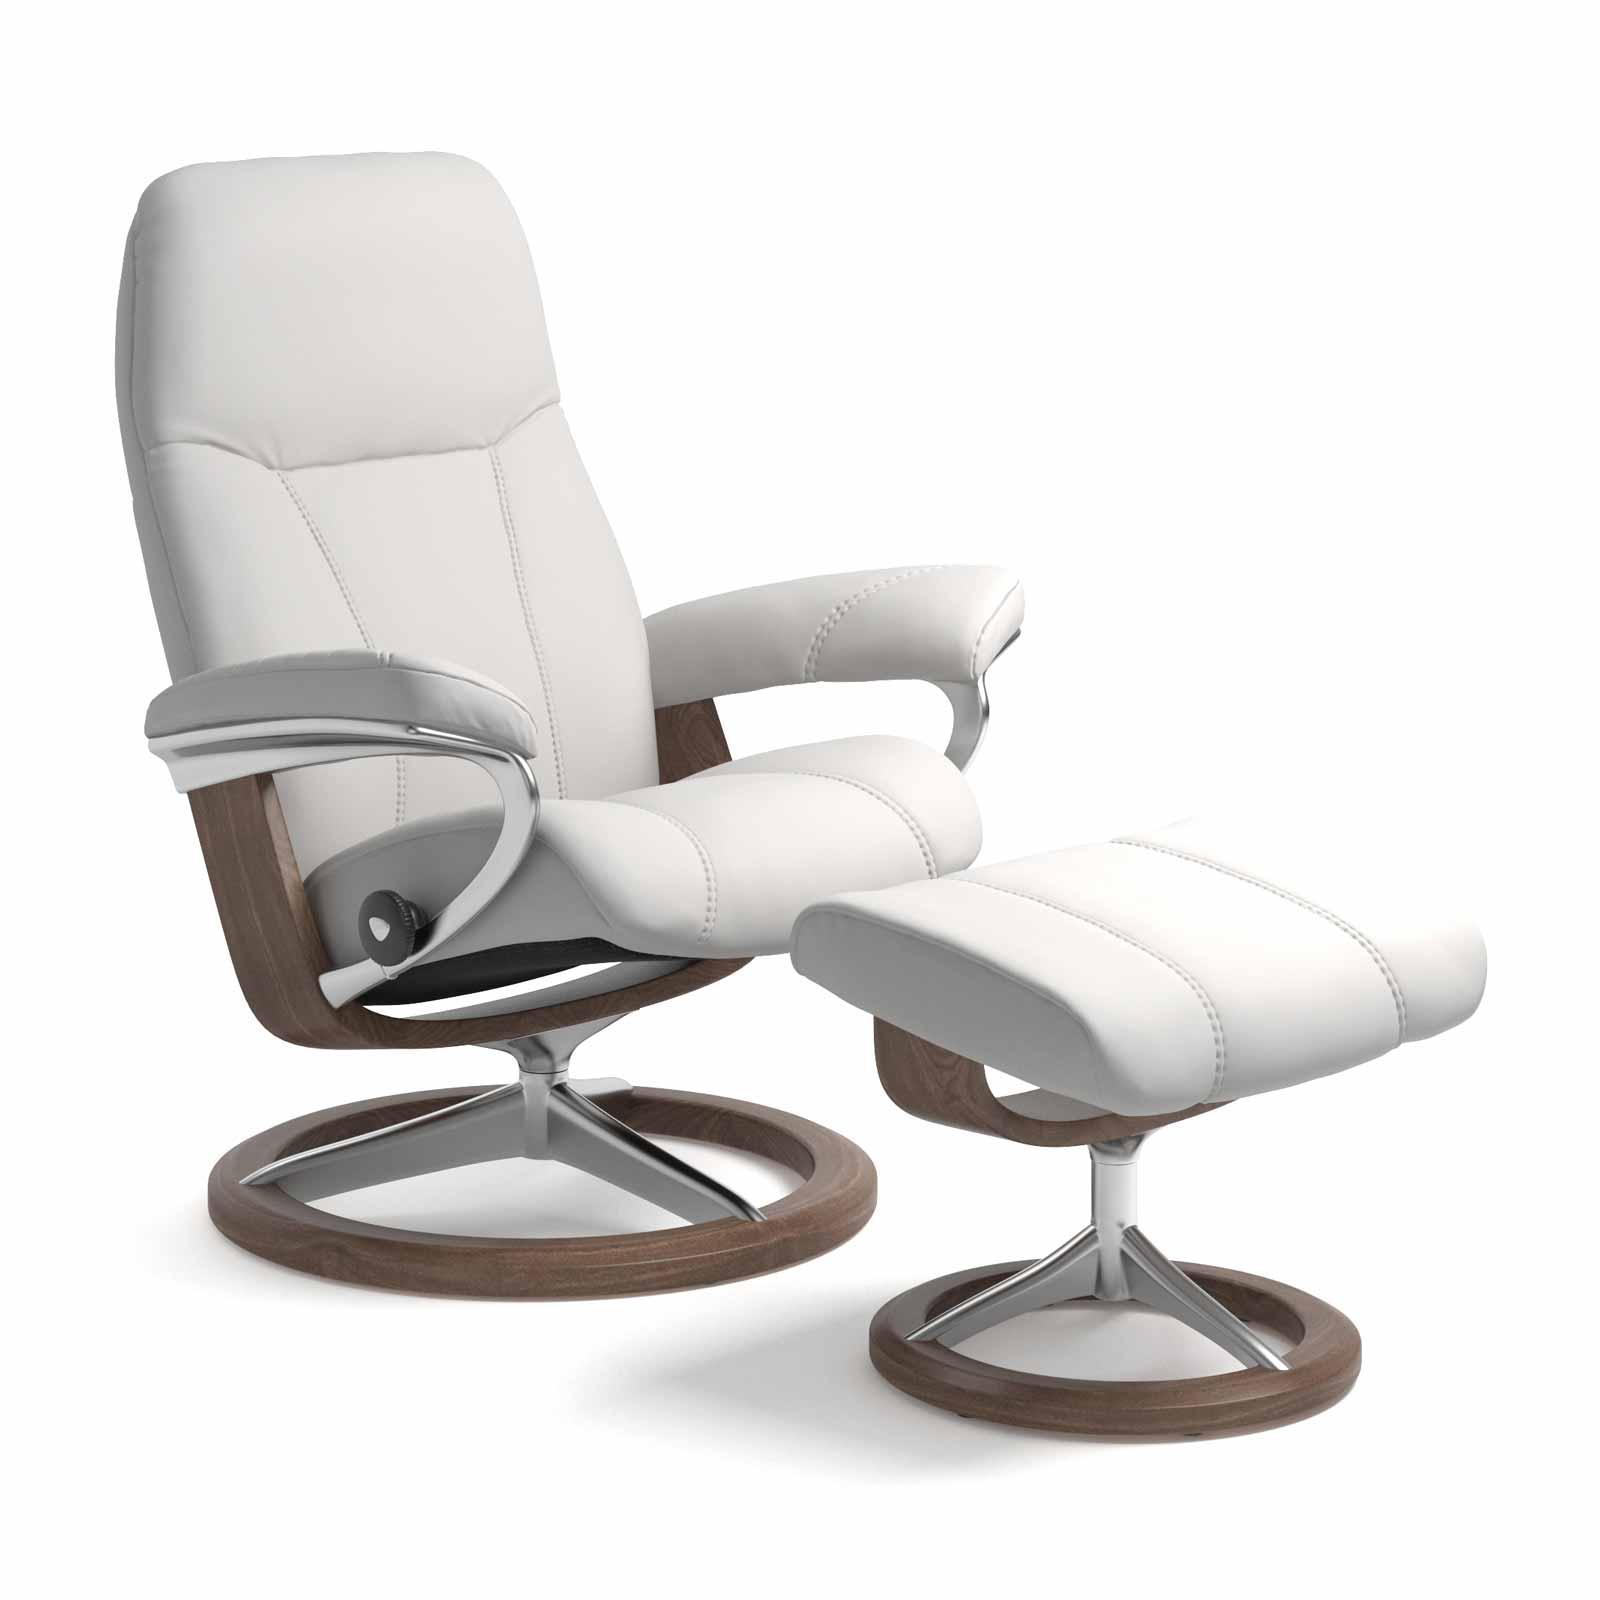 stressless sessel consul signature batick snow mit hocker. Black Bedroom Furniture Sets. Home Design Ideas